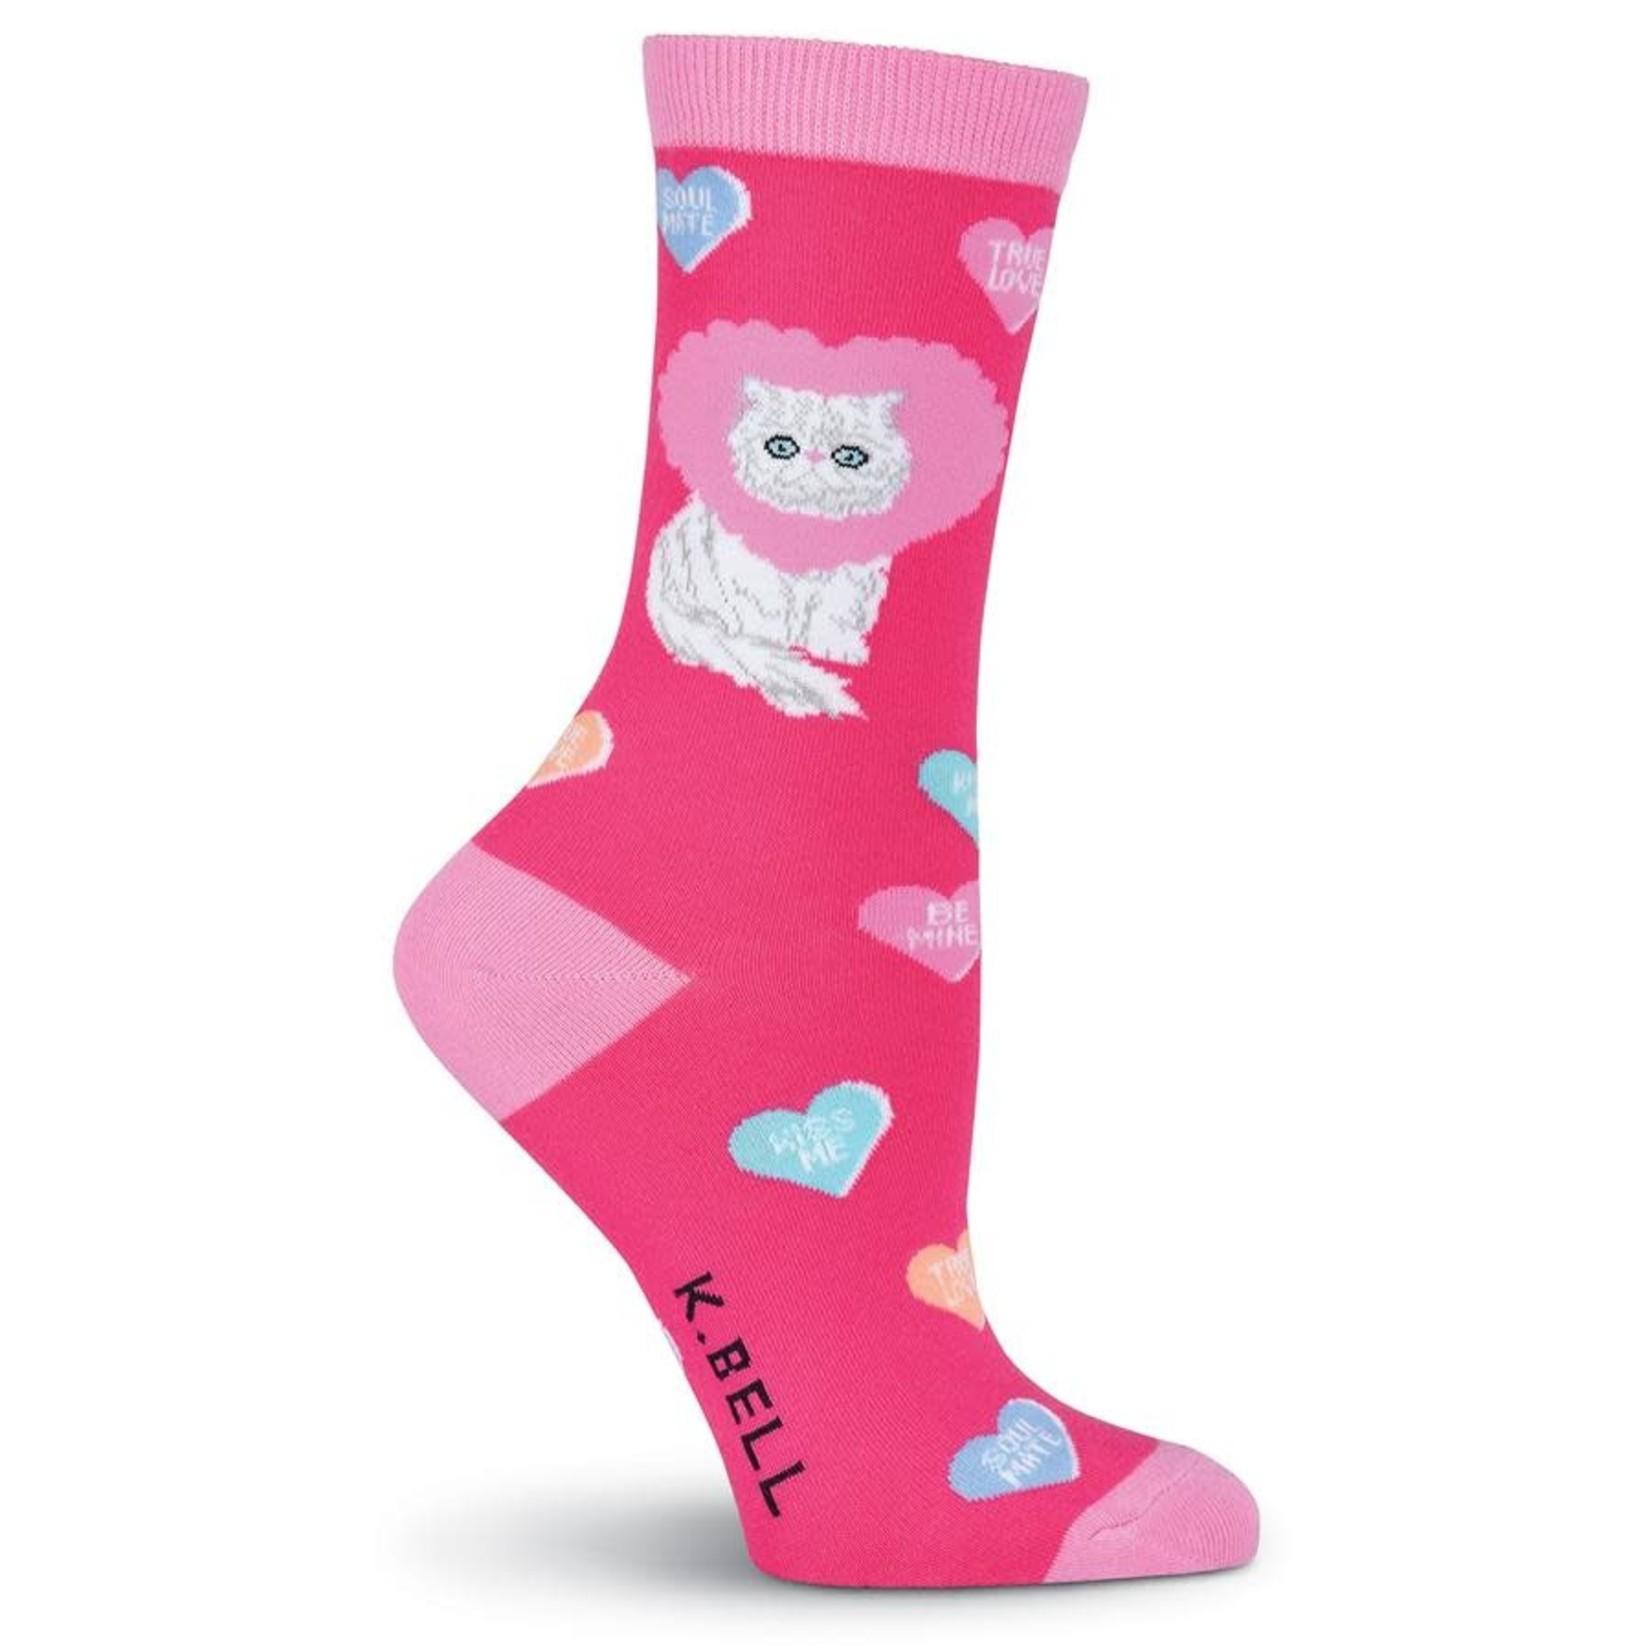 Socks (Womens) - White Cat